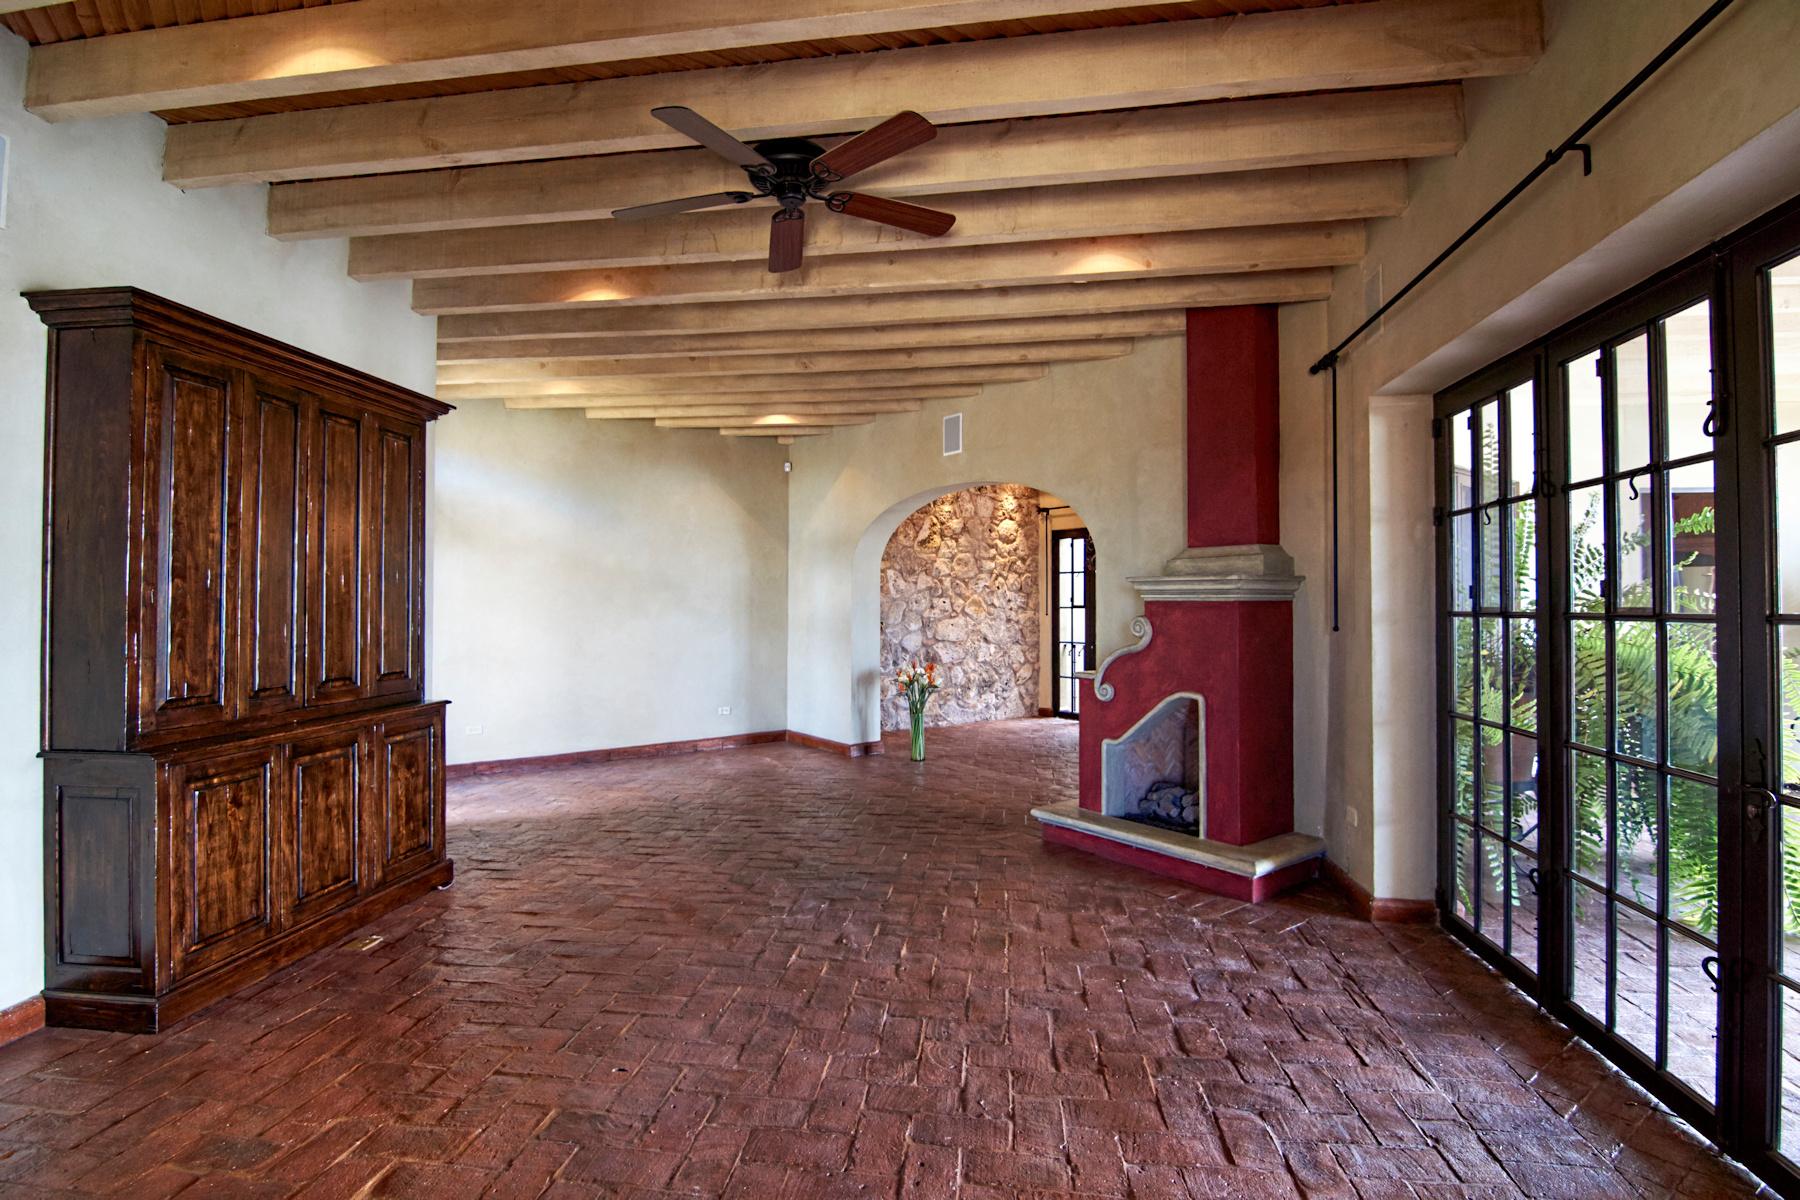 Additional photo for property listing at CASA CHEPITOS Centro, San Miguel De Allende, Guanajuato Mexico